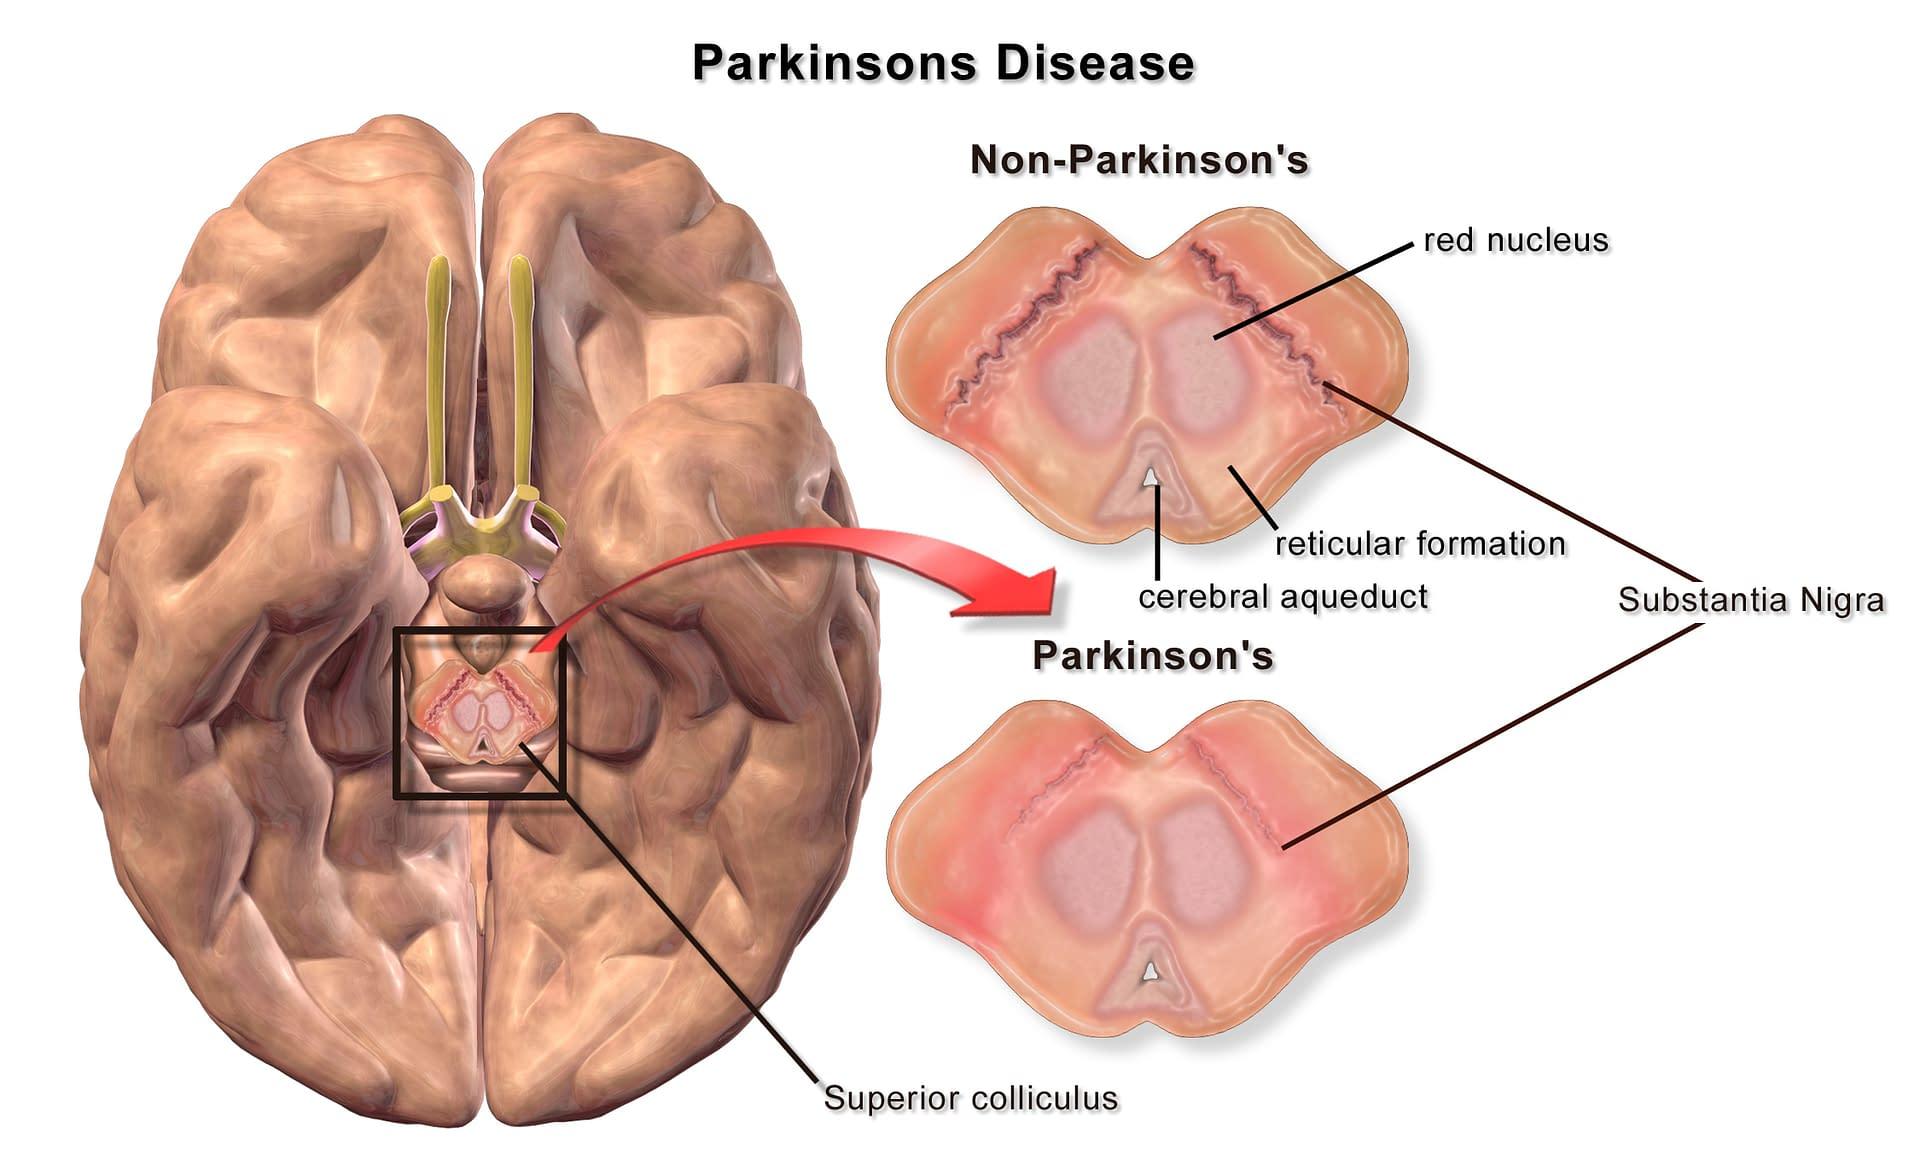 Parkinson's Disease from Agent Orange Exposure